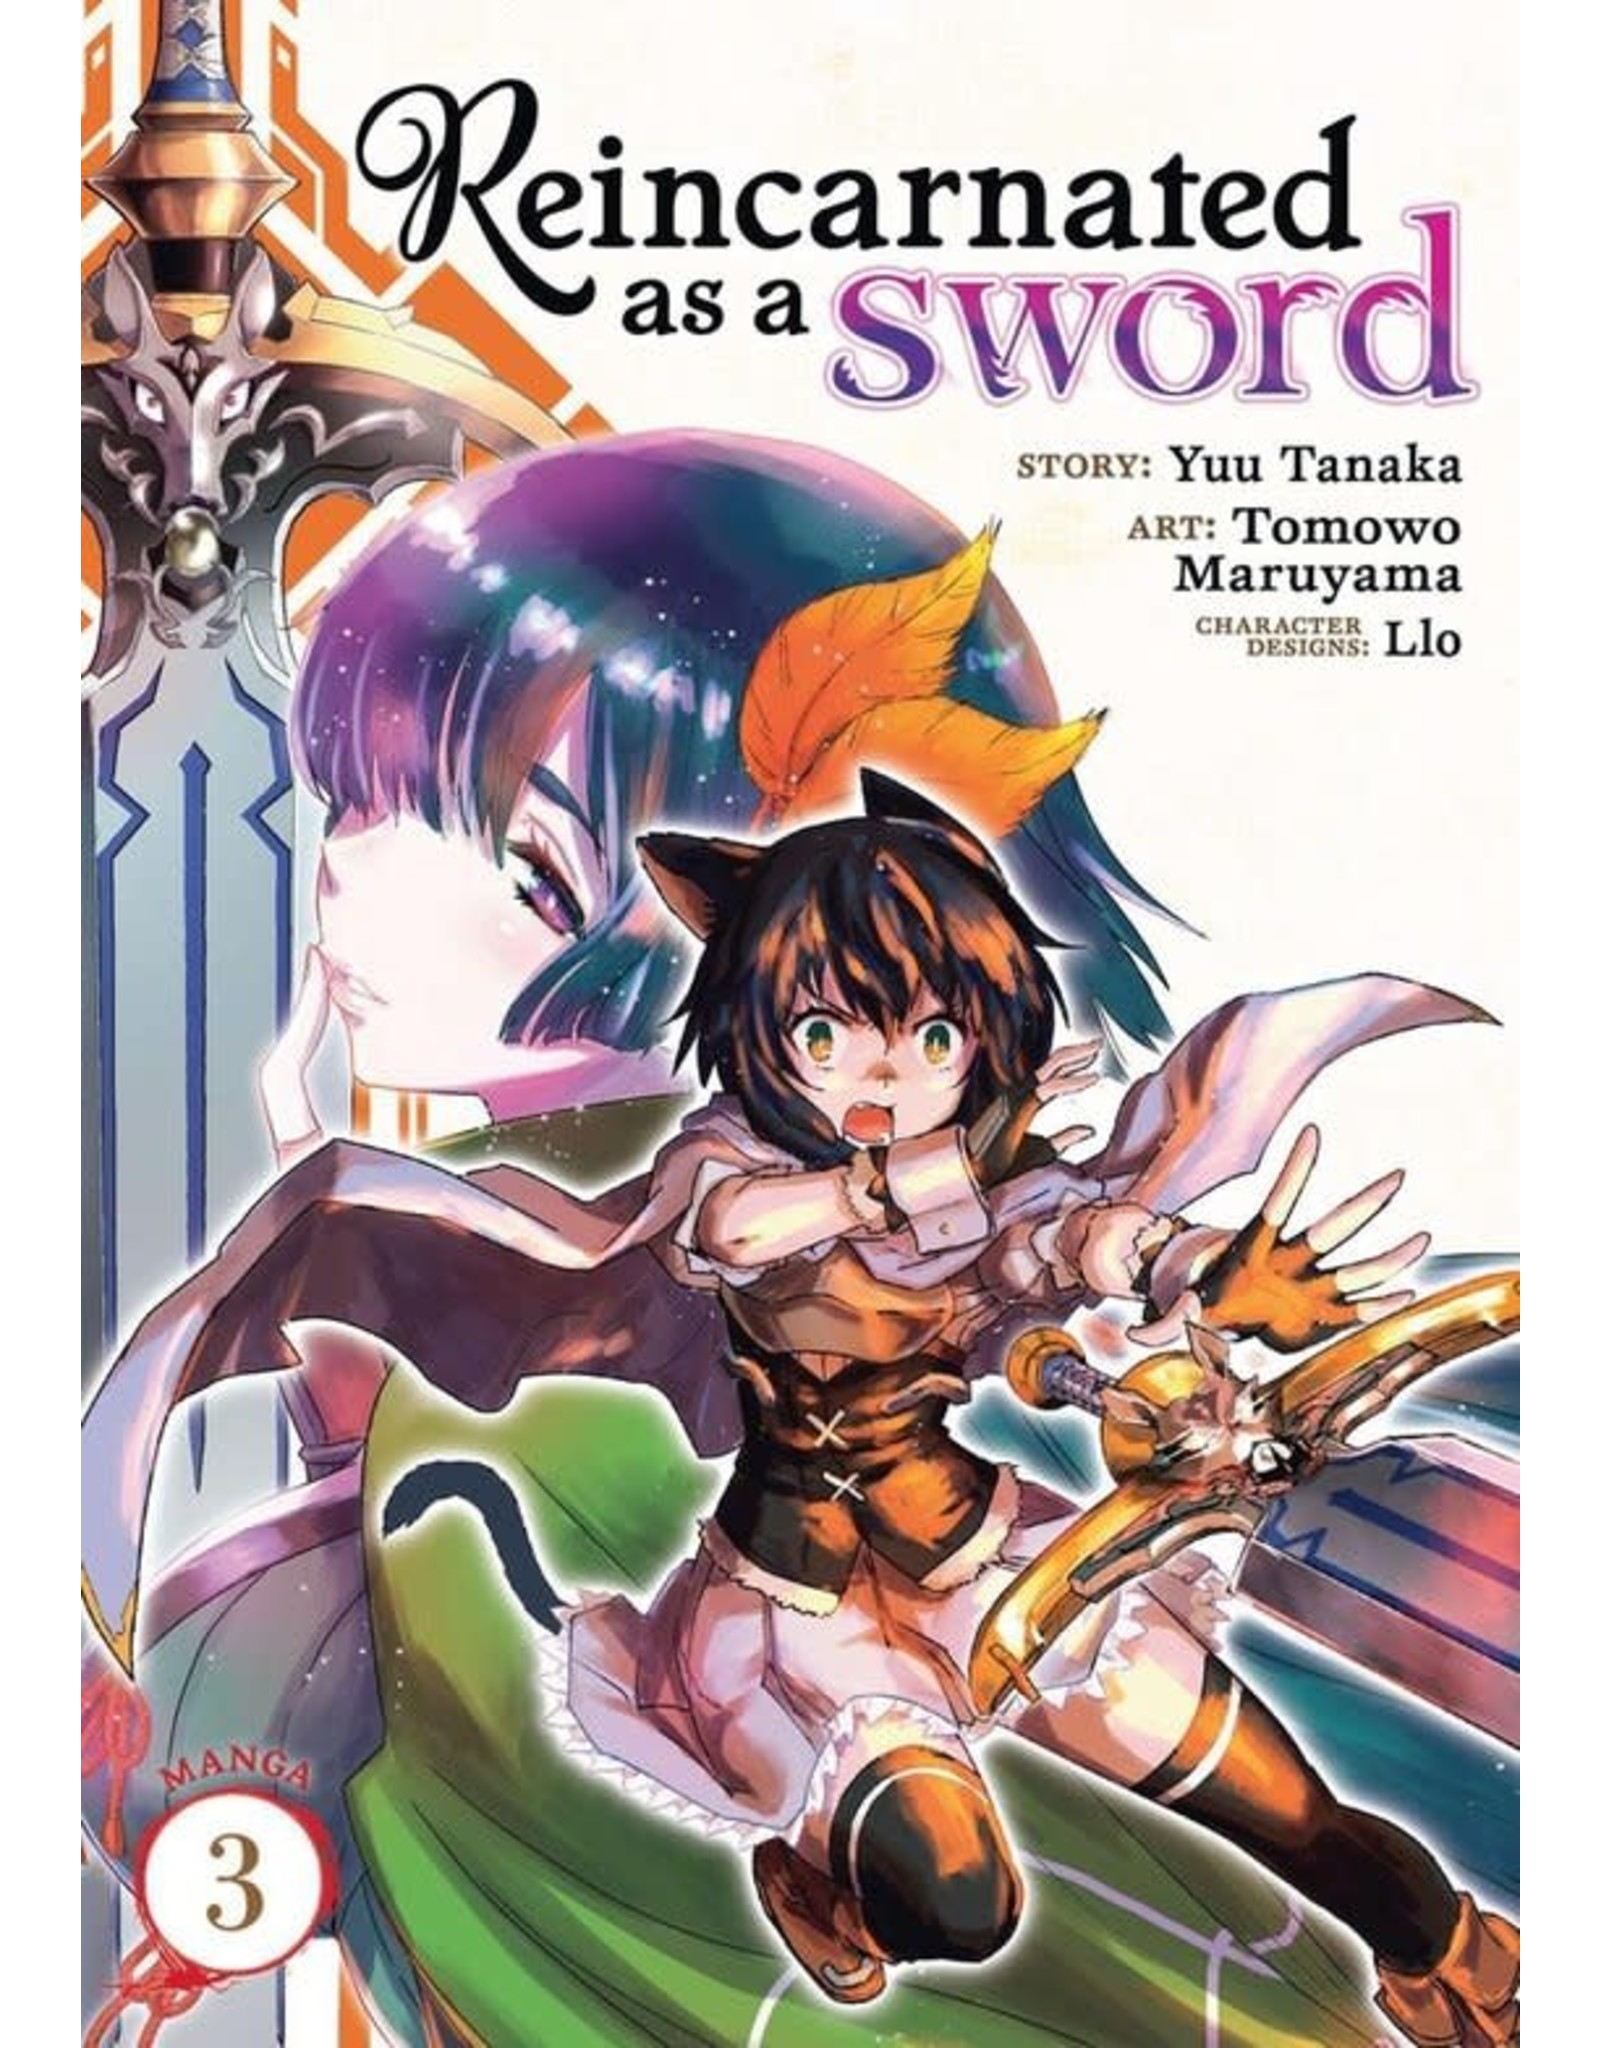 Reincarnated as a Sword 3 (Engelstalig) - Manga